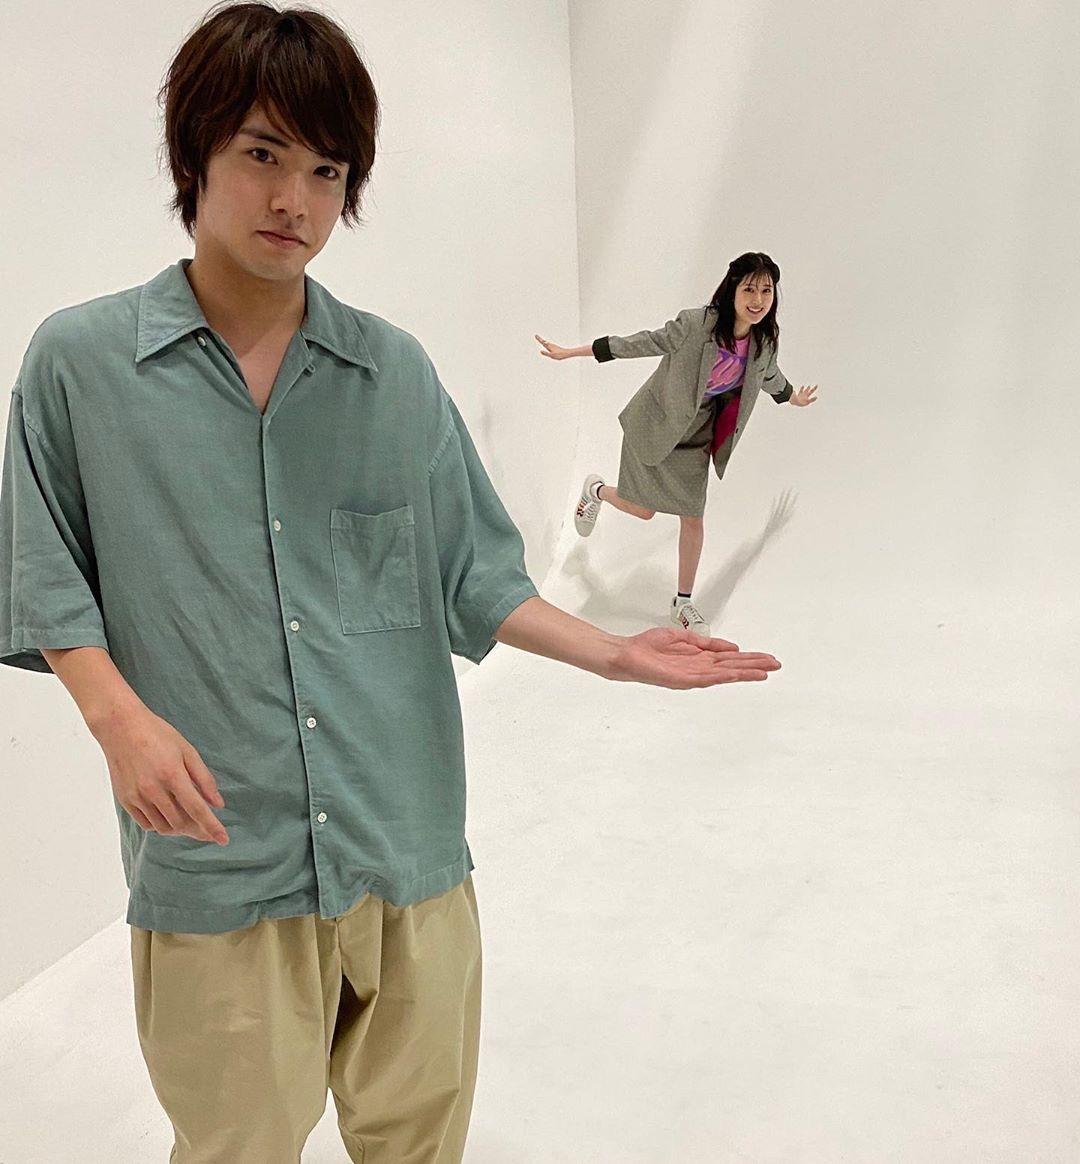 8 935 Likes 27 Comments 映画 思い 思われ ふり ふられ 公式 Furifura Movie On Instagram みんなの115万枚のフィルムキャンペーン 実施記念 ふりふらオ In 2020 Men Casual Button Down Shirt Mens Tops